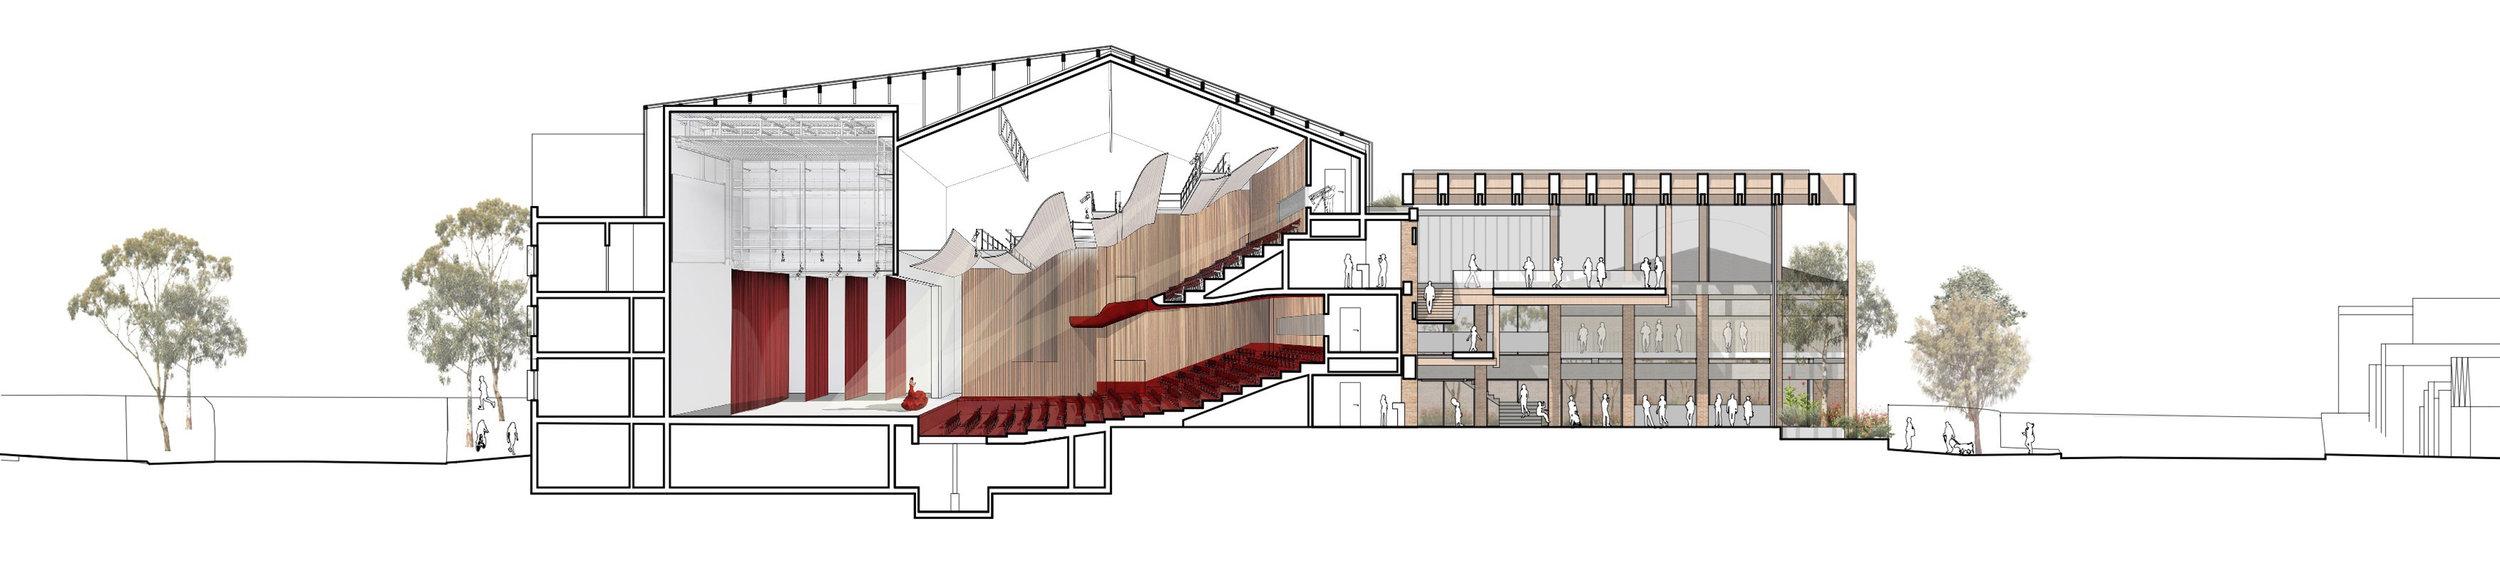 sutherland-entertainment-centre-chrofi-nbrs-architecture-the-design-emotive-06.jpg